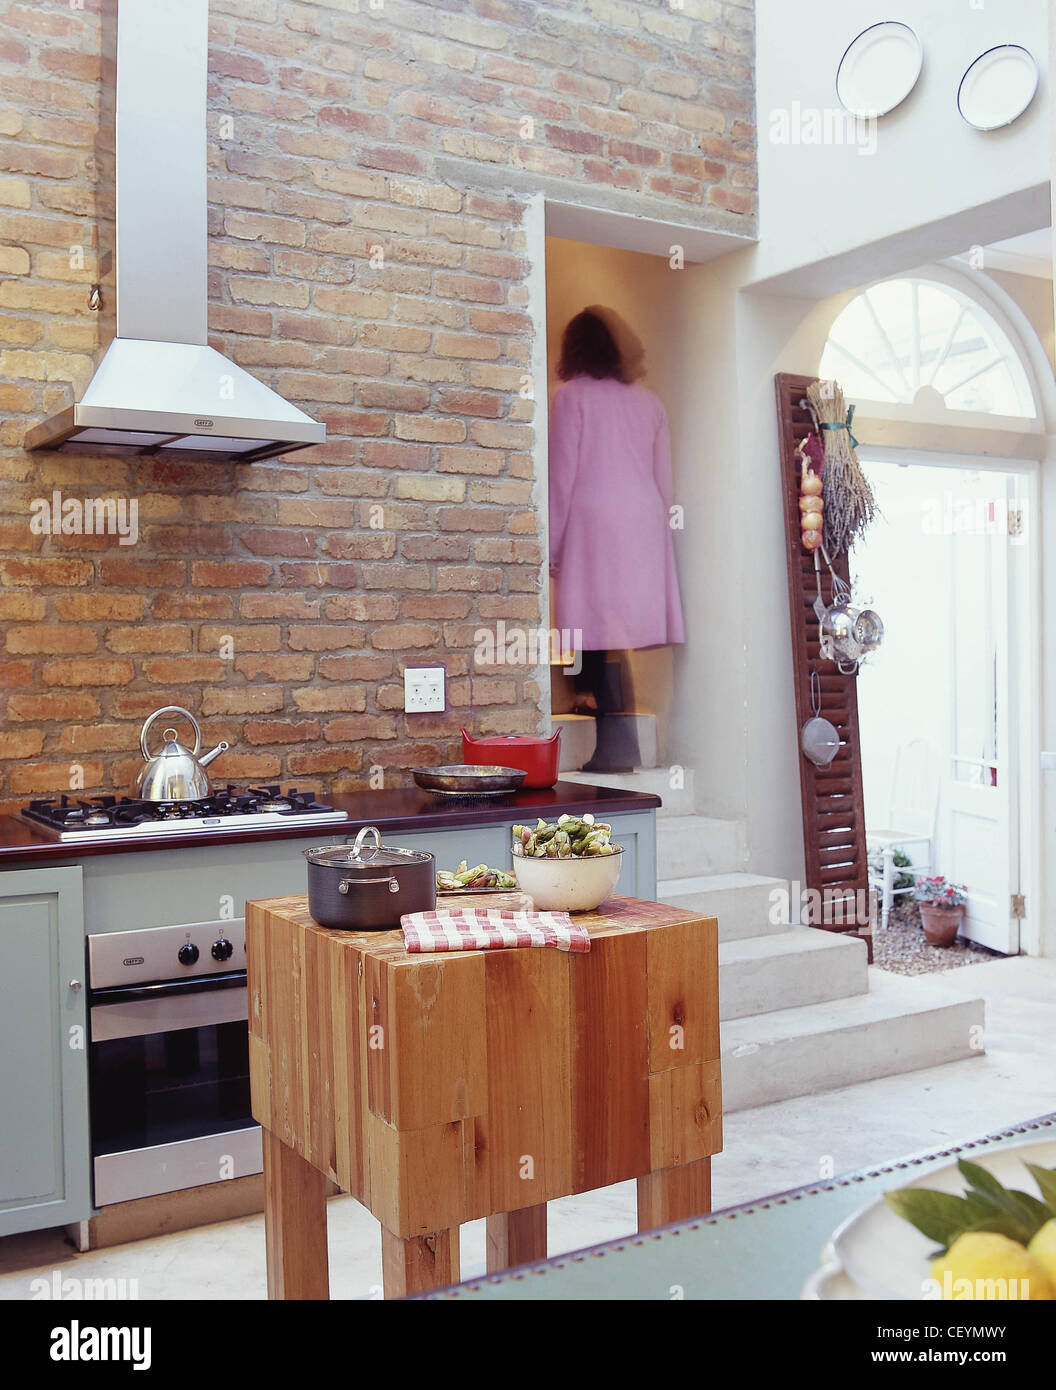 Tre diversi stili di cucina cucina bare di parete di mattoni ...